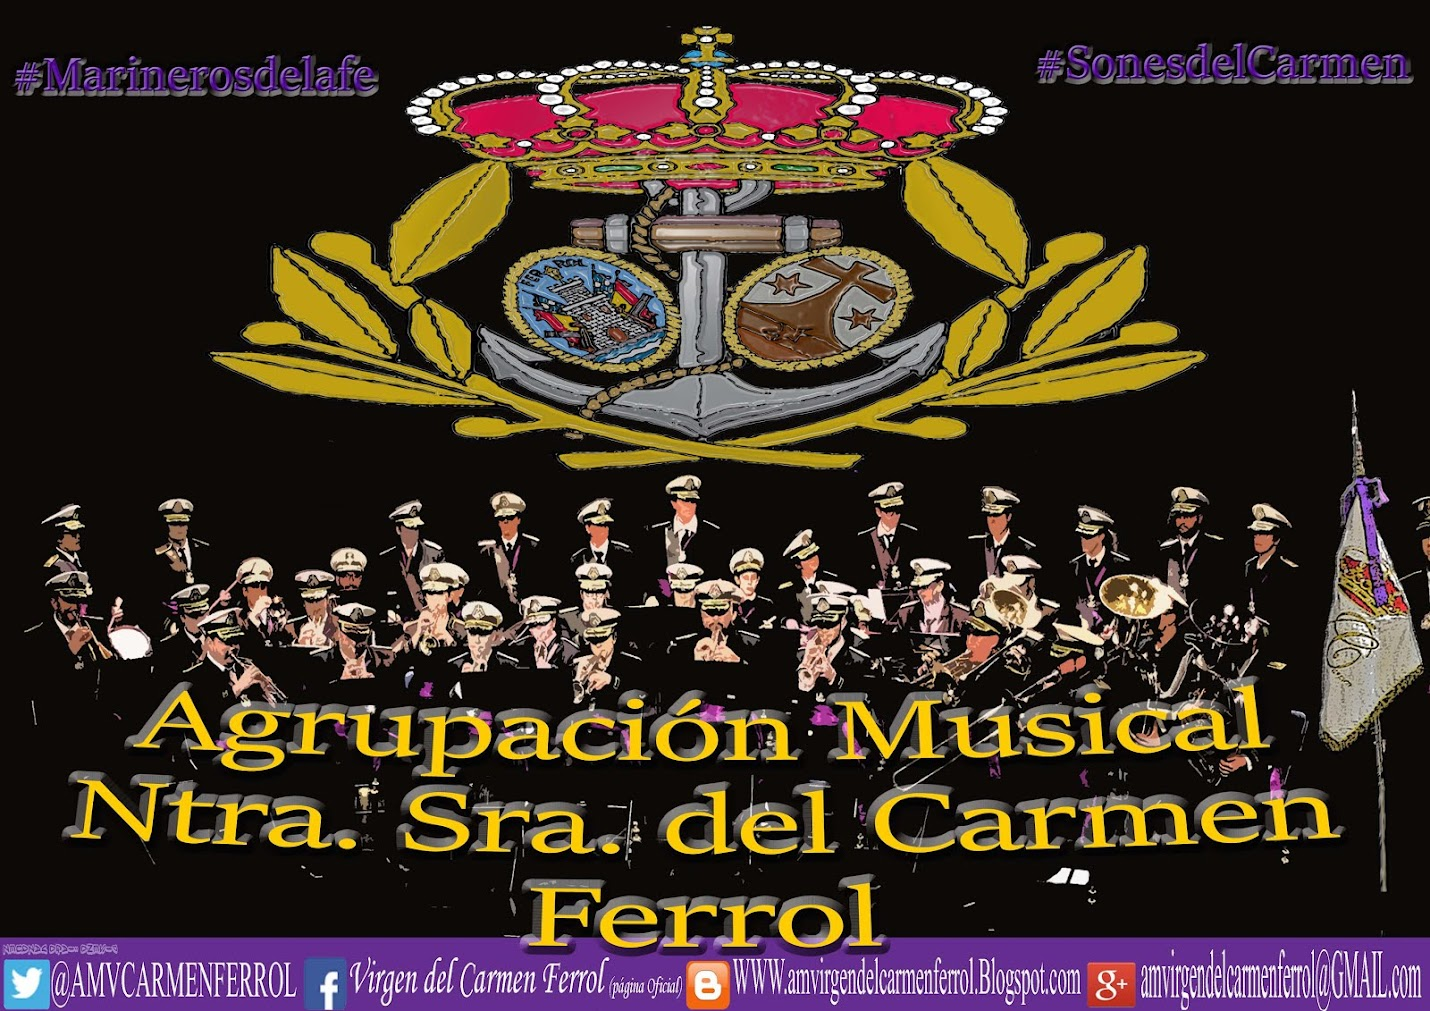 A.M. Ntra. Sra. del Carmen ~Ferrol~